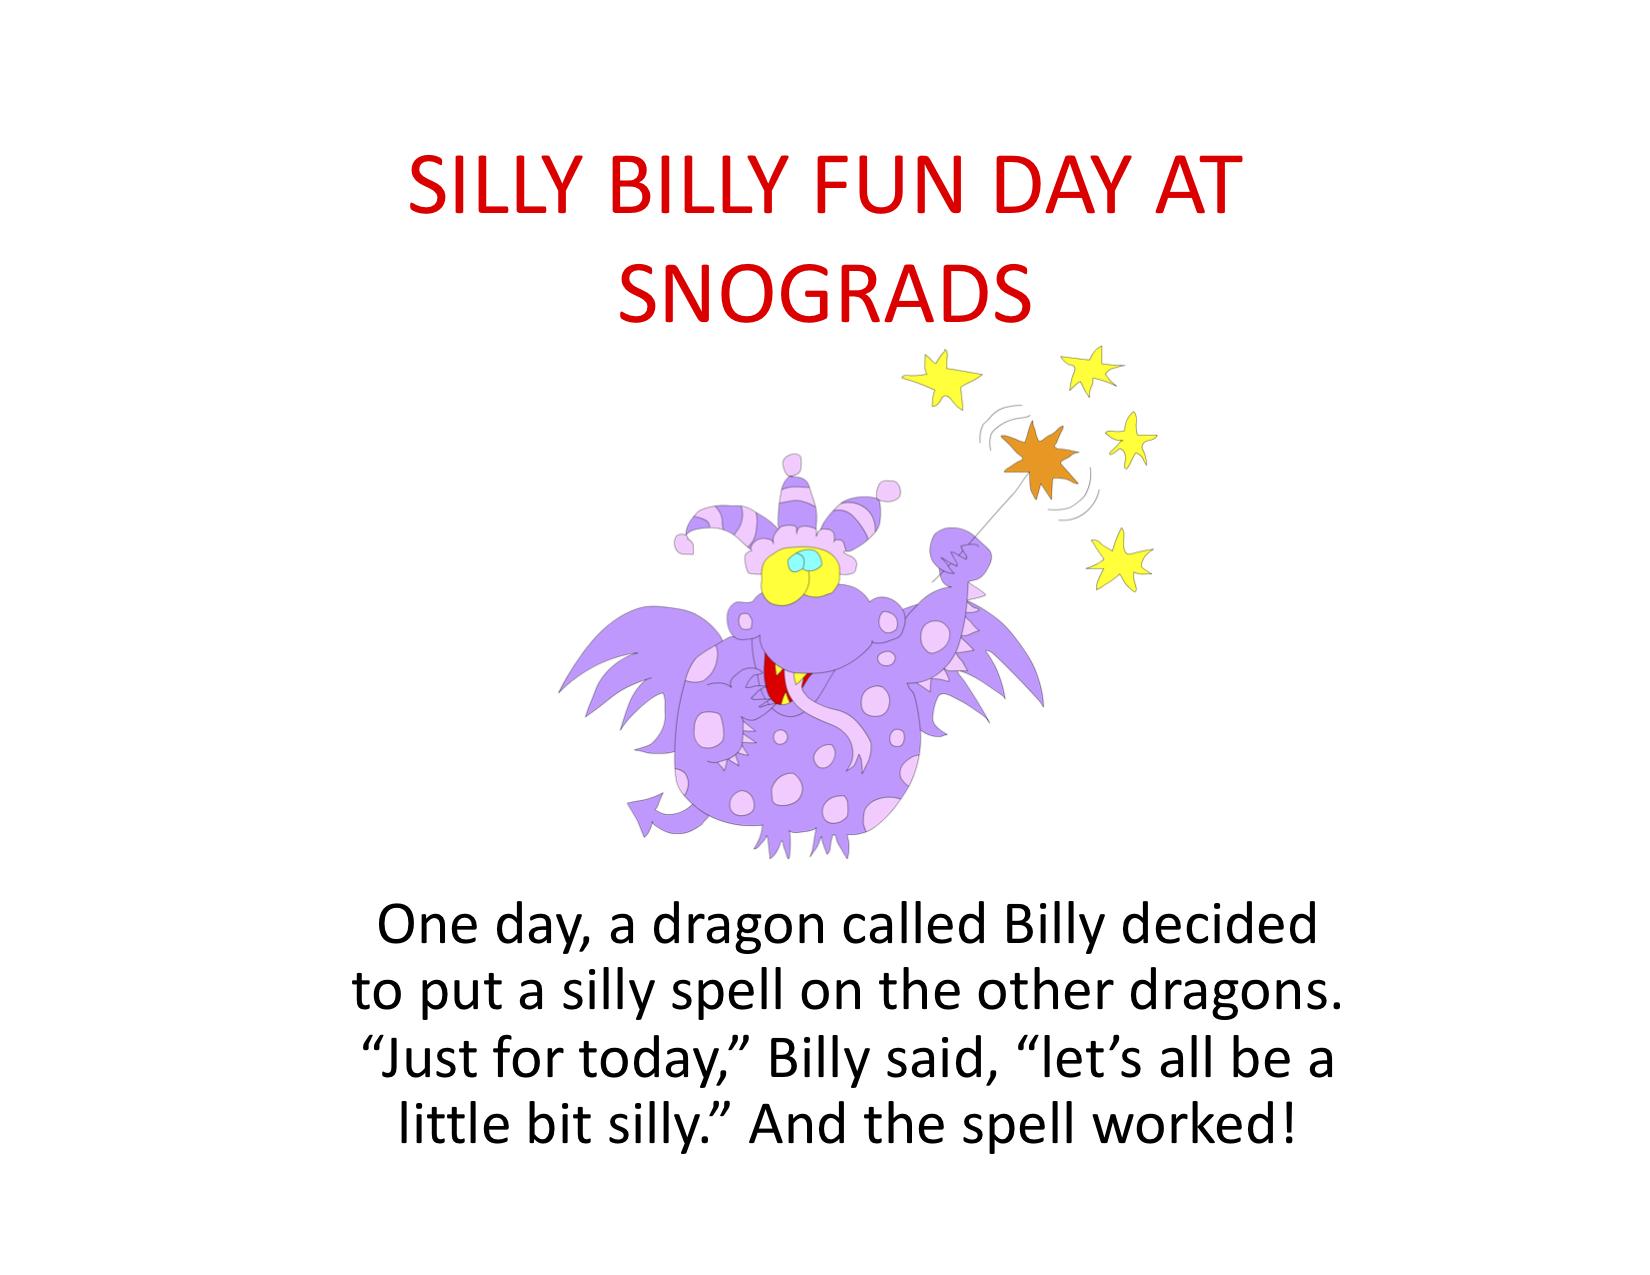 SillyBillyFunDayUSETHIS (dragged)